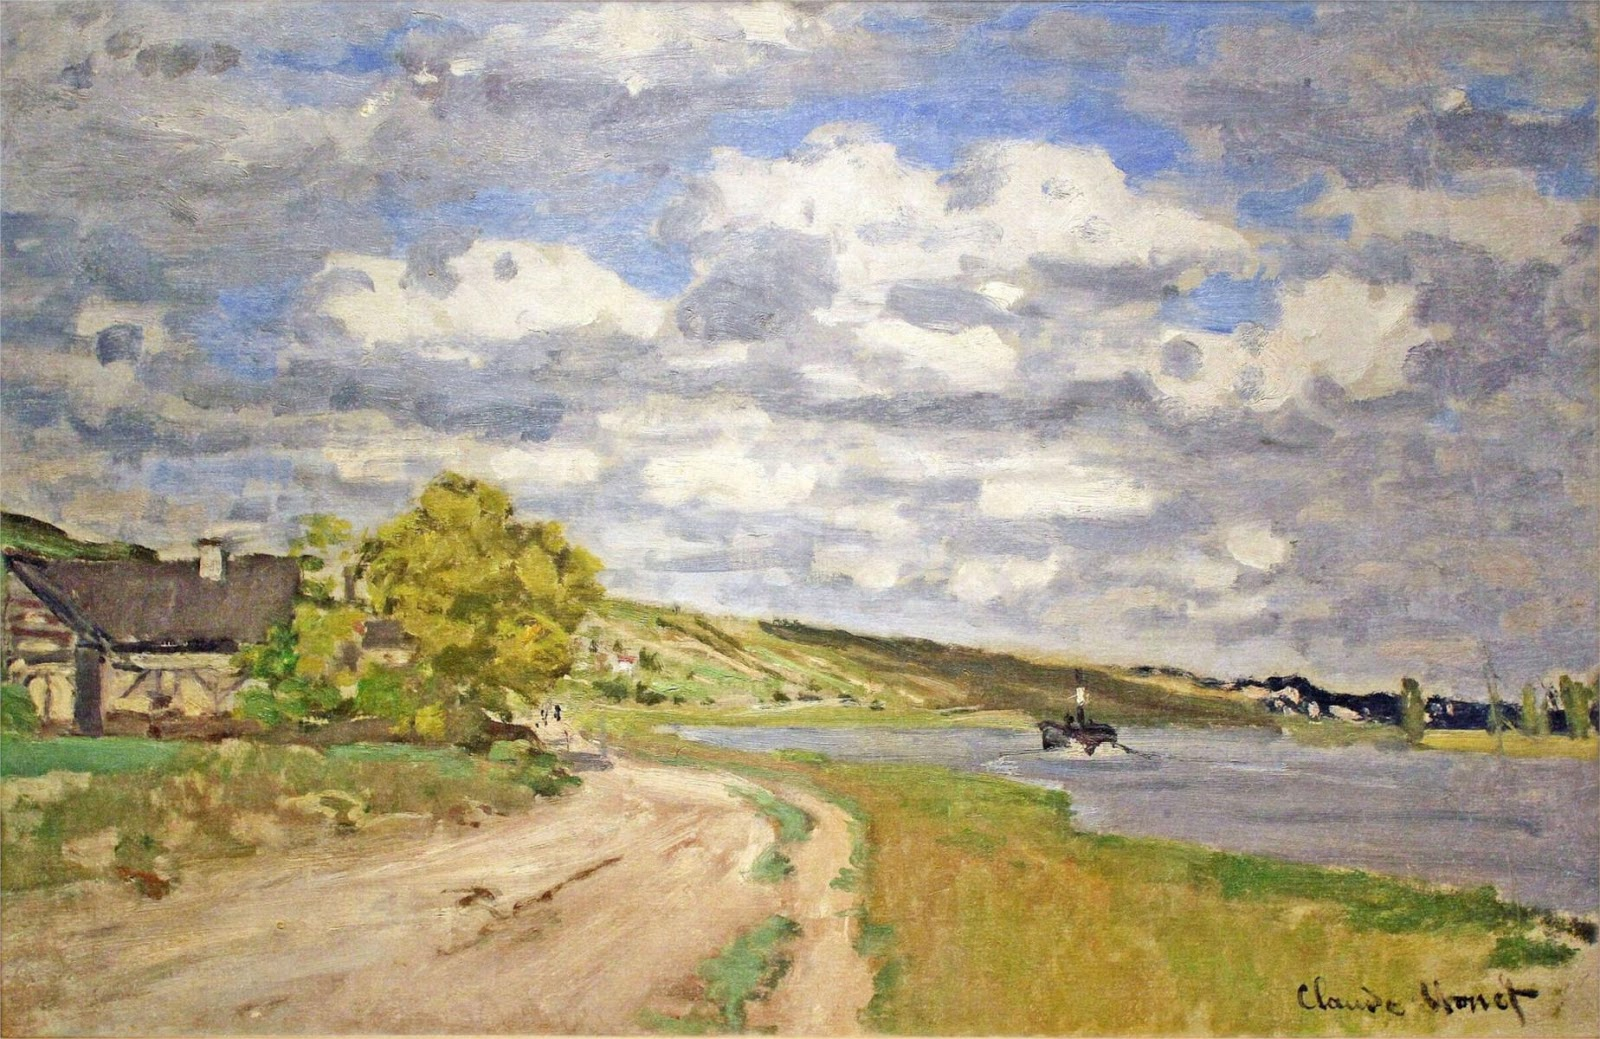 Claude Monet - part 4 1868 - 1870Insta Reyog